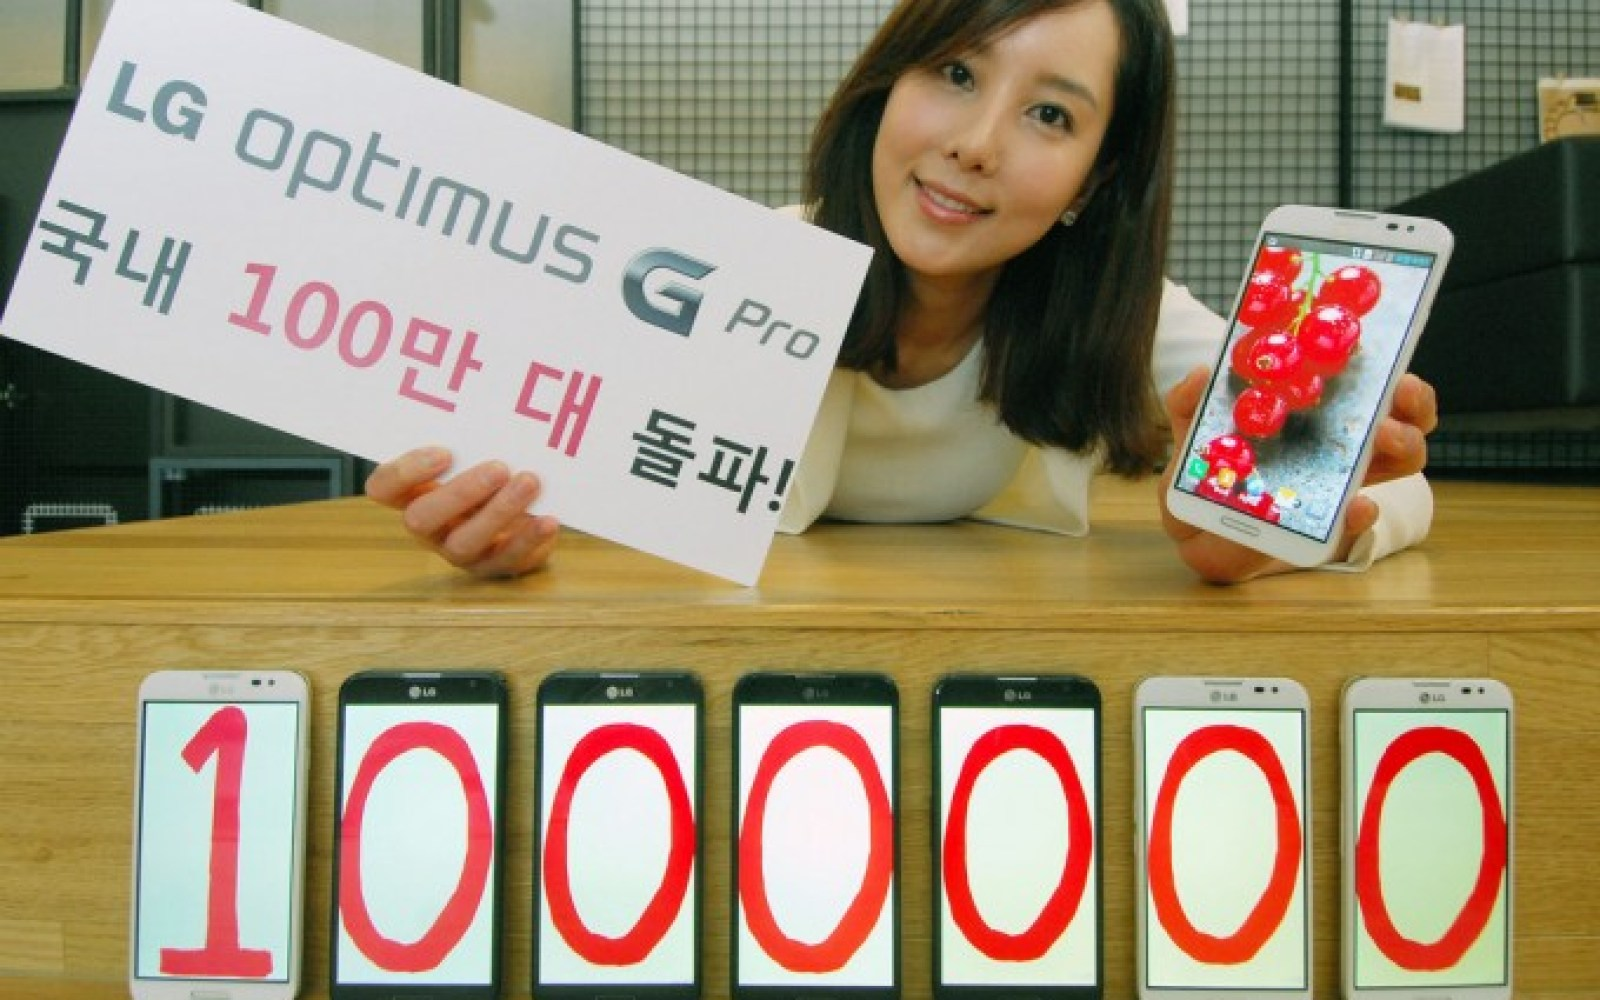 LG sells a million Optimus G Pro handsets in Korea